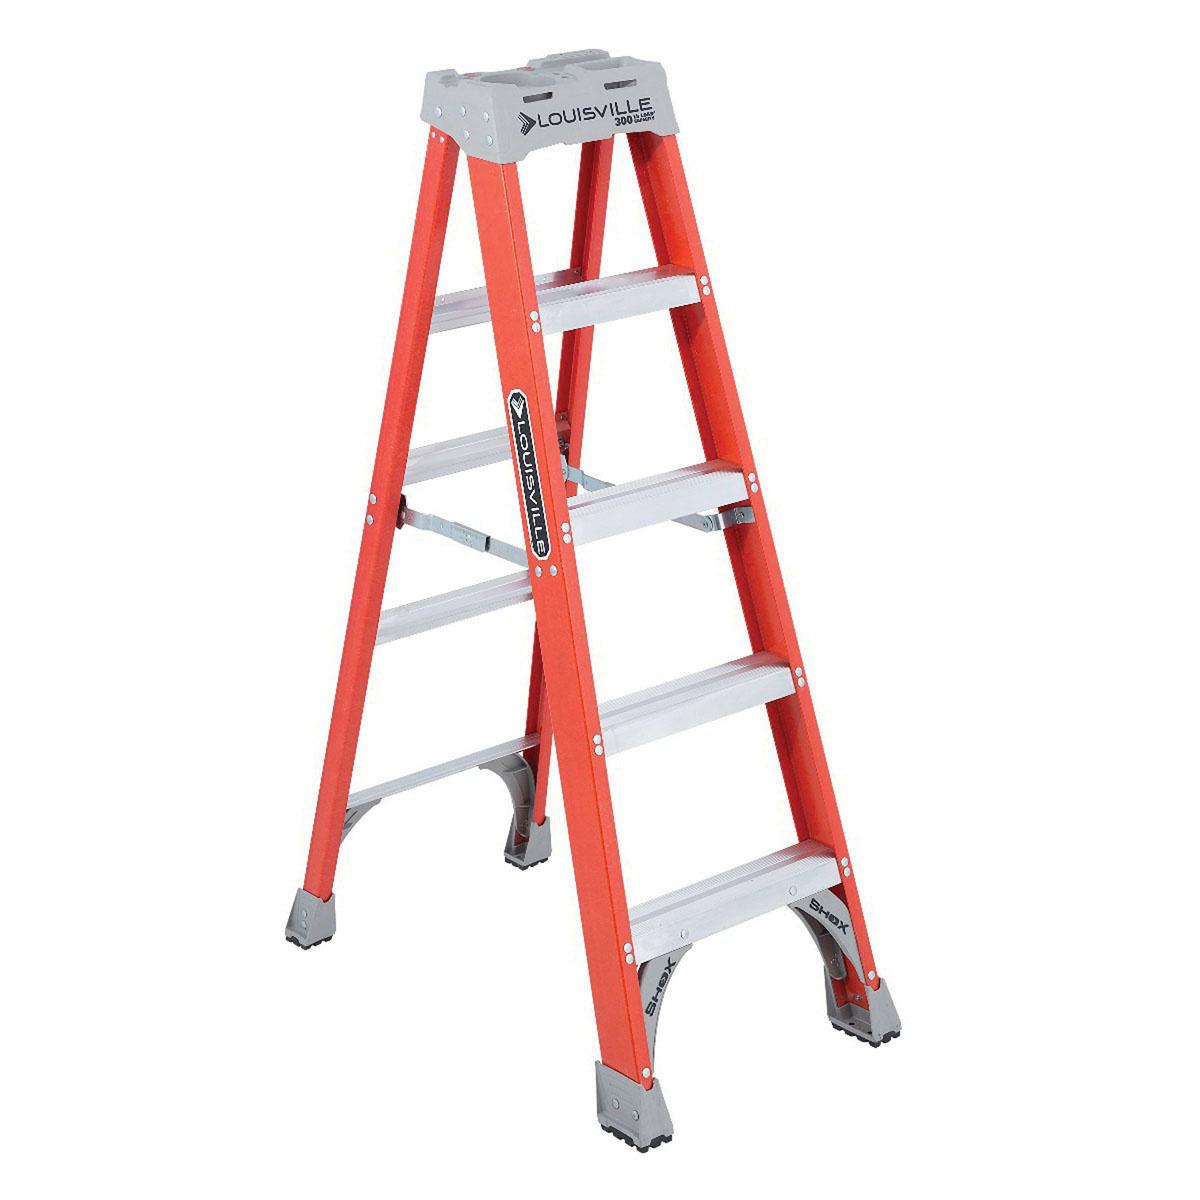 Miraculous Louisville Ladder Fs1505 Fiberglass Fs1500 Series Type Ia Pabps2019 Chair Design Images Pabps2019Com